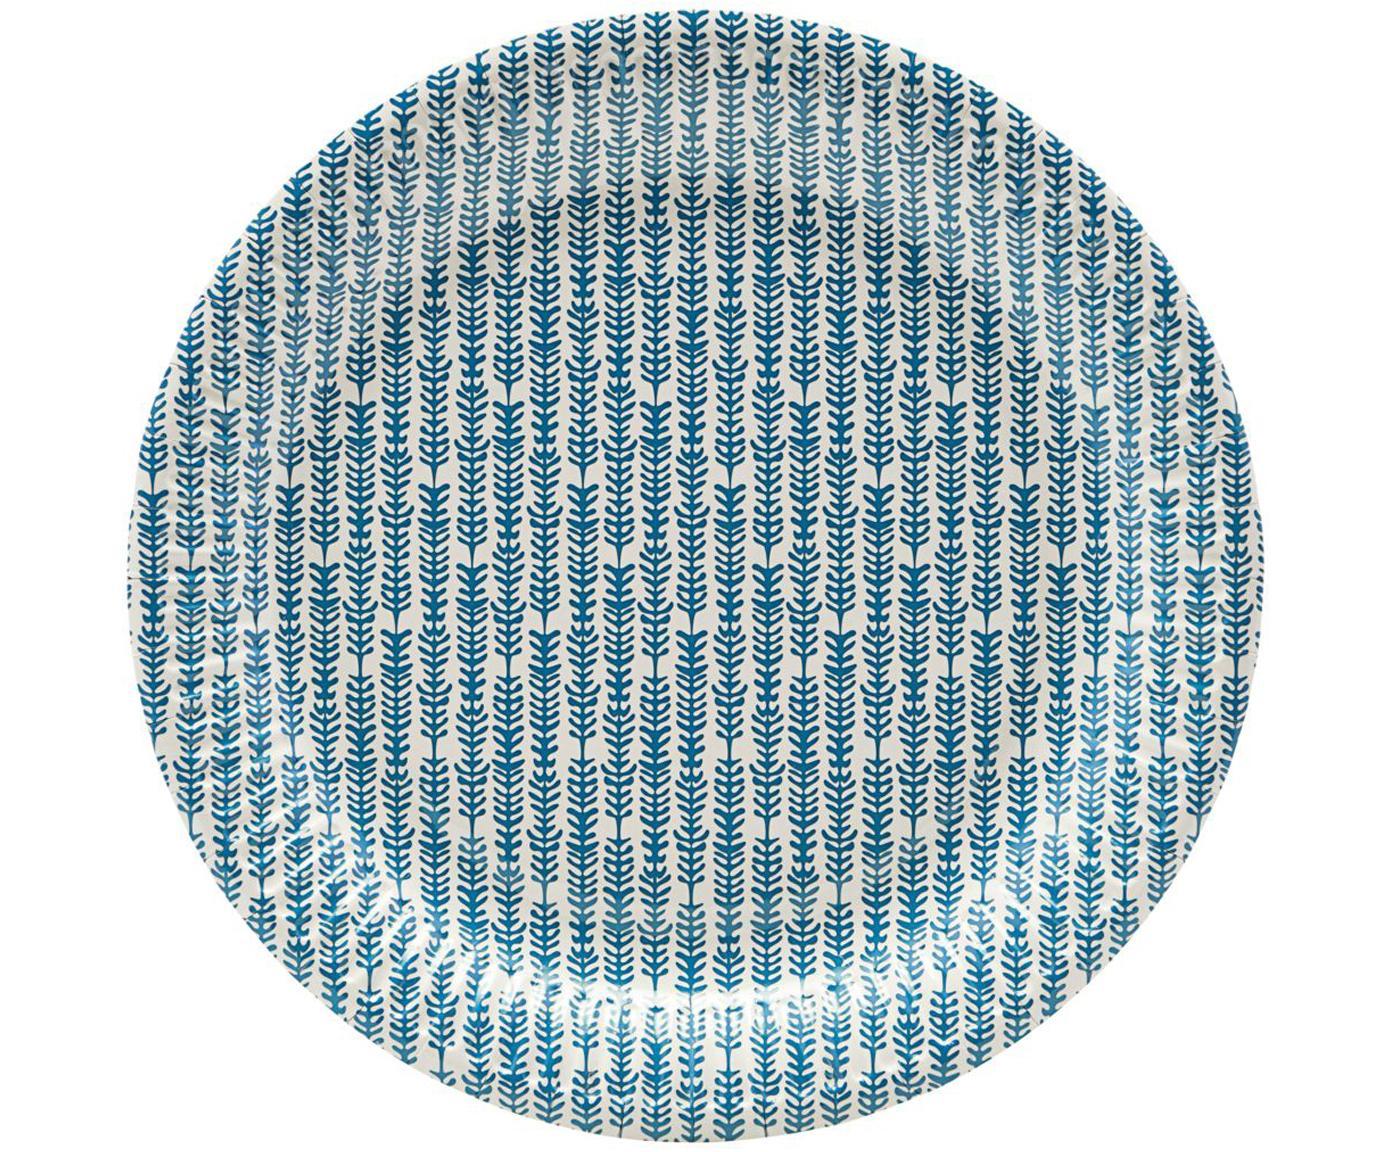 Papier-Teller Branch, 12 Stück, Papier, Blau, Weiß, Ø 23 x H 1 cm